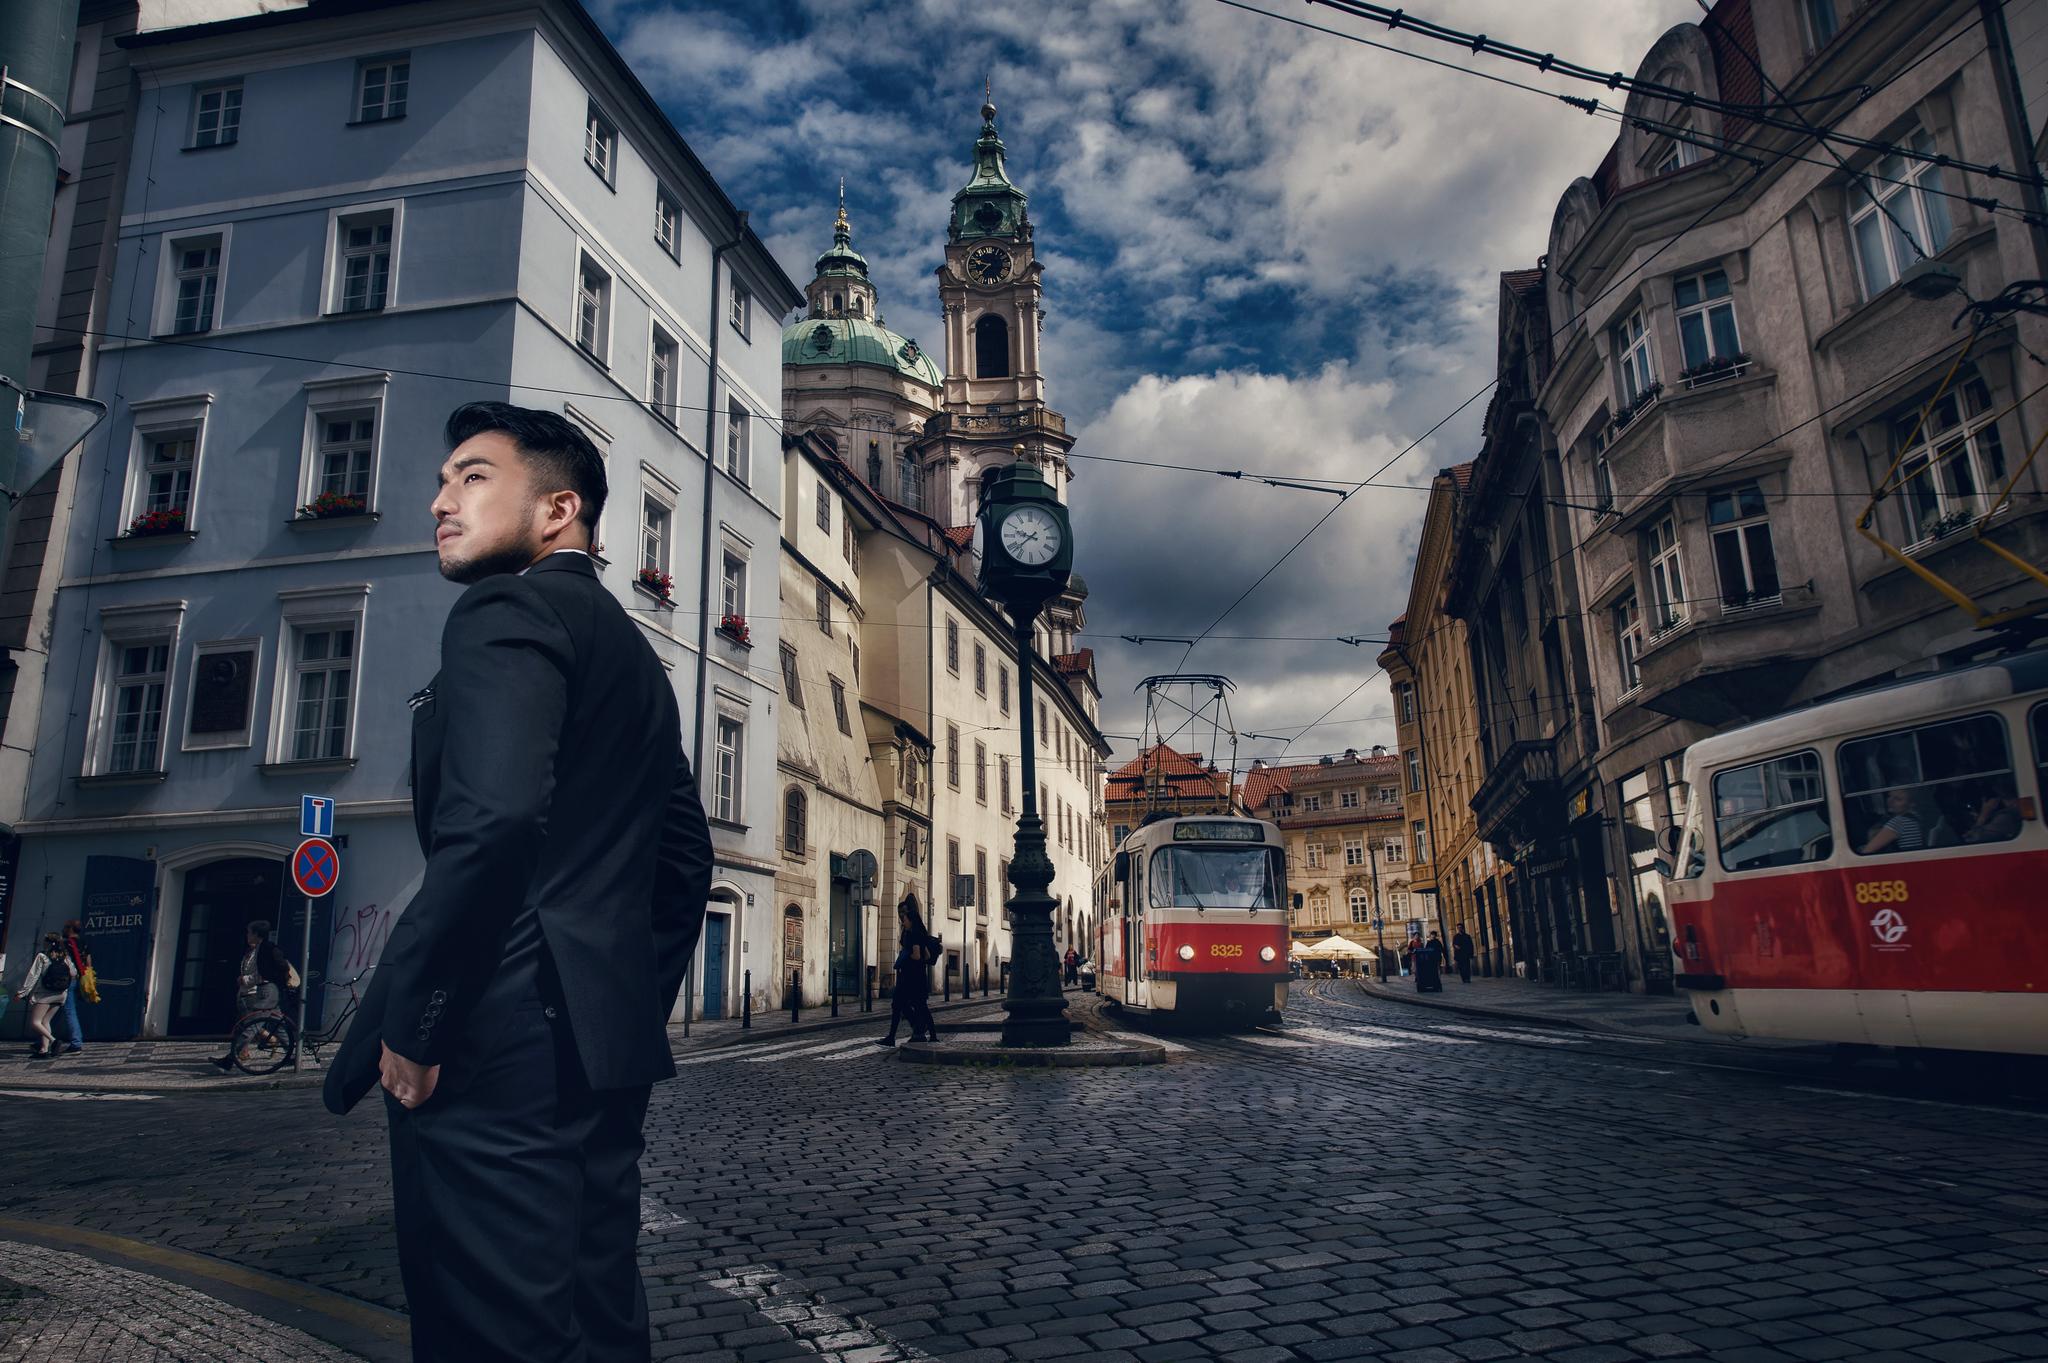 Donfer, 海外婚紗, World tour, 東法, EASTERN WEDDING, 世界旅拍, 布拉格, 捷克婚紗 , Praha, Prague